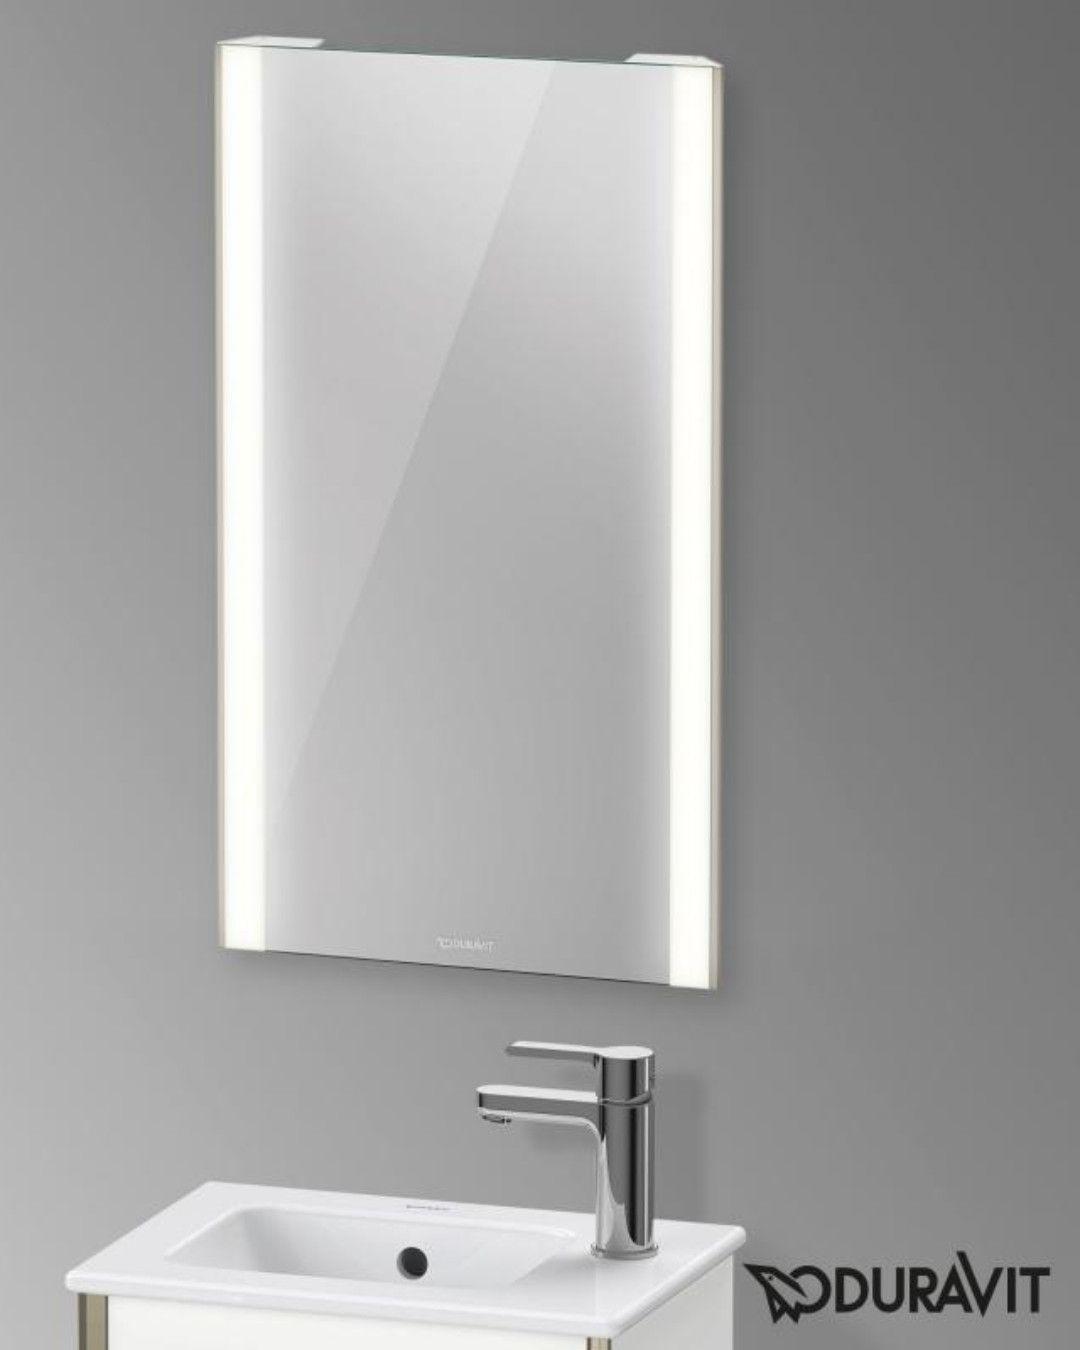 Duravit Xviu Spiegel Mit Led Beleuchtung Sensor Version Champagner Matt Xv70300b1b1 Led Spiegel Led Beleuchtung Led